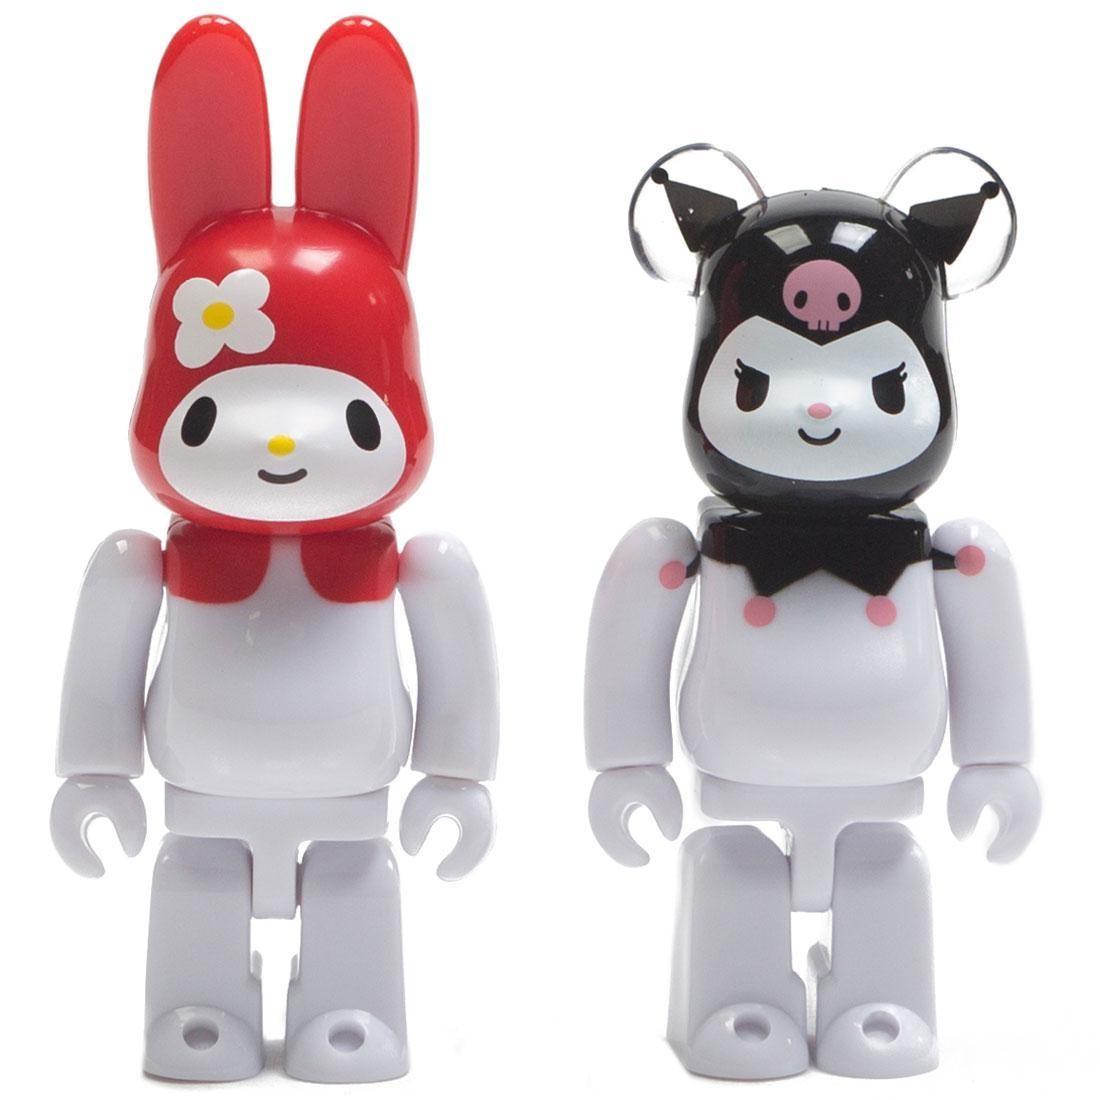 Medicom My Melody Red Ver. Rabbrick And Kuromi Bearbrick 100% Figure 2 Pack Set (white)